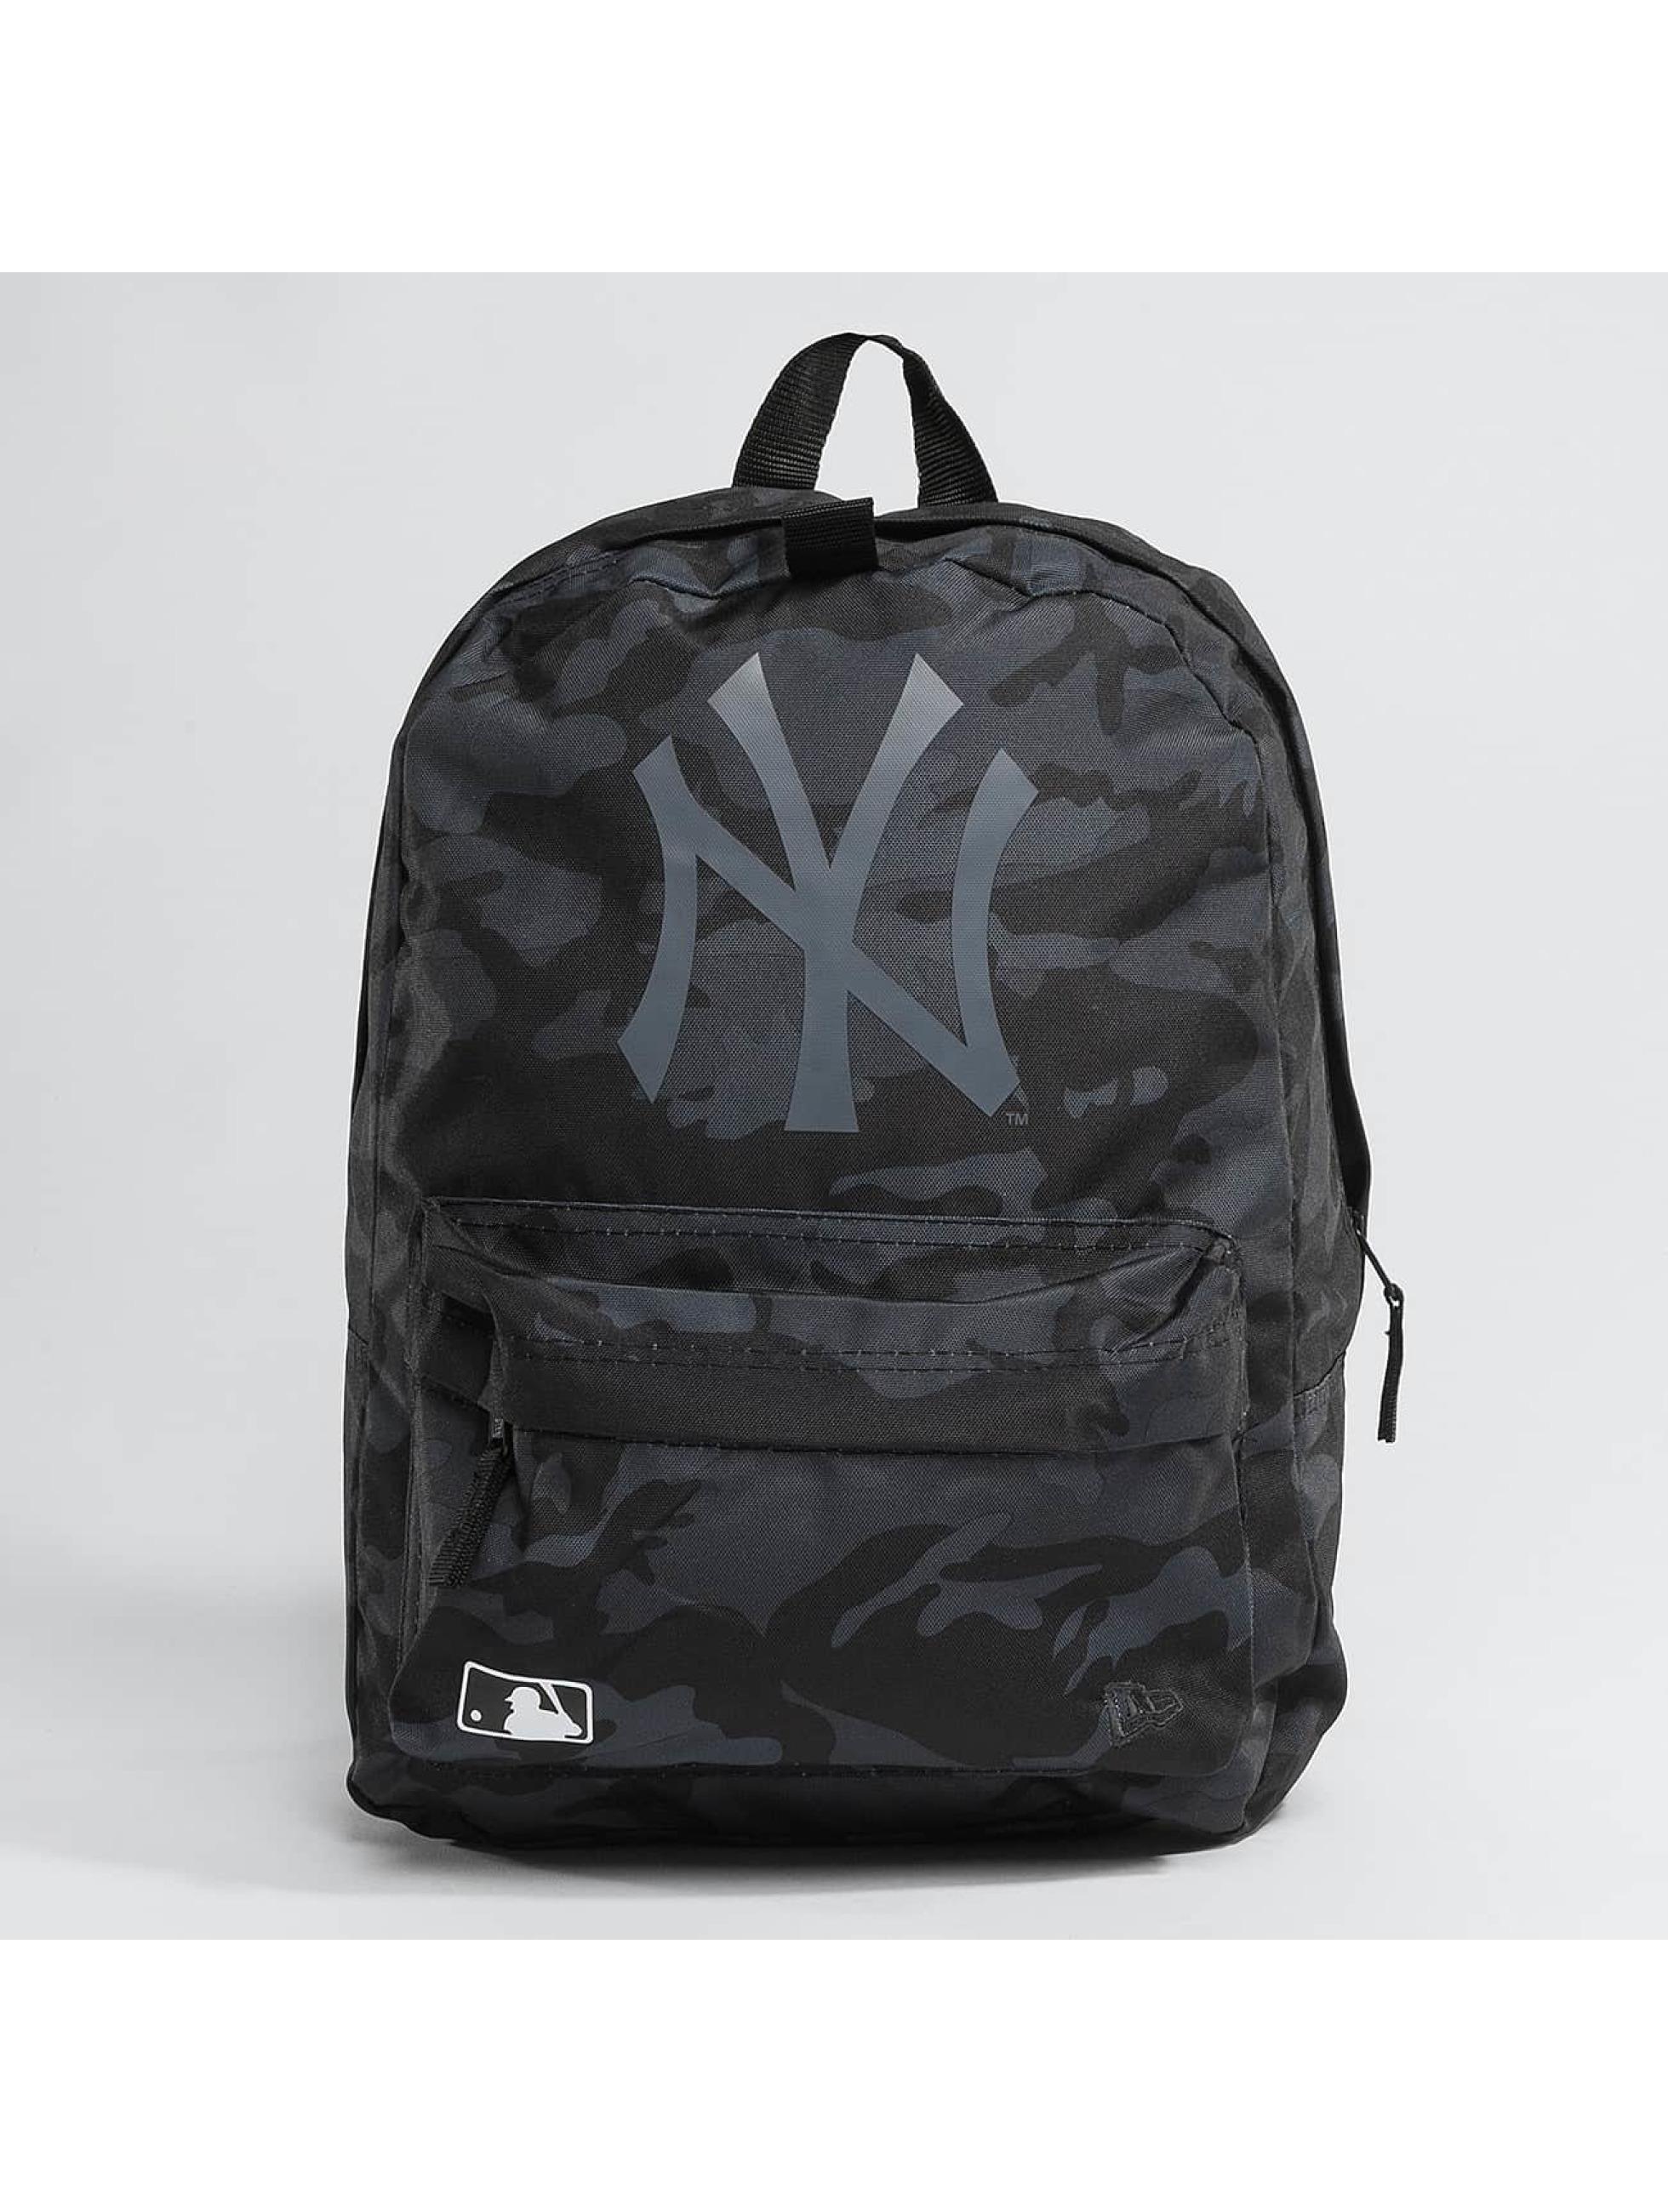 New Era Männer,Frauen Rucksack MLB Stadium NY Yankees in camouflage